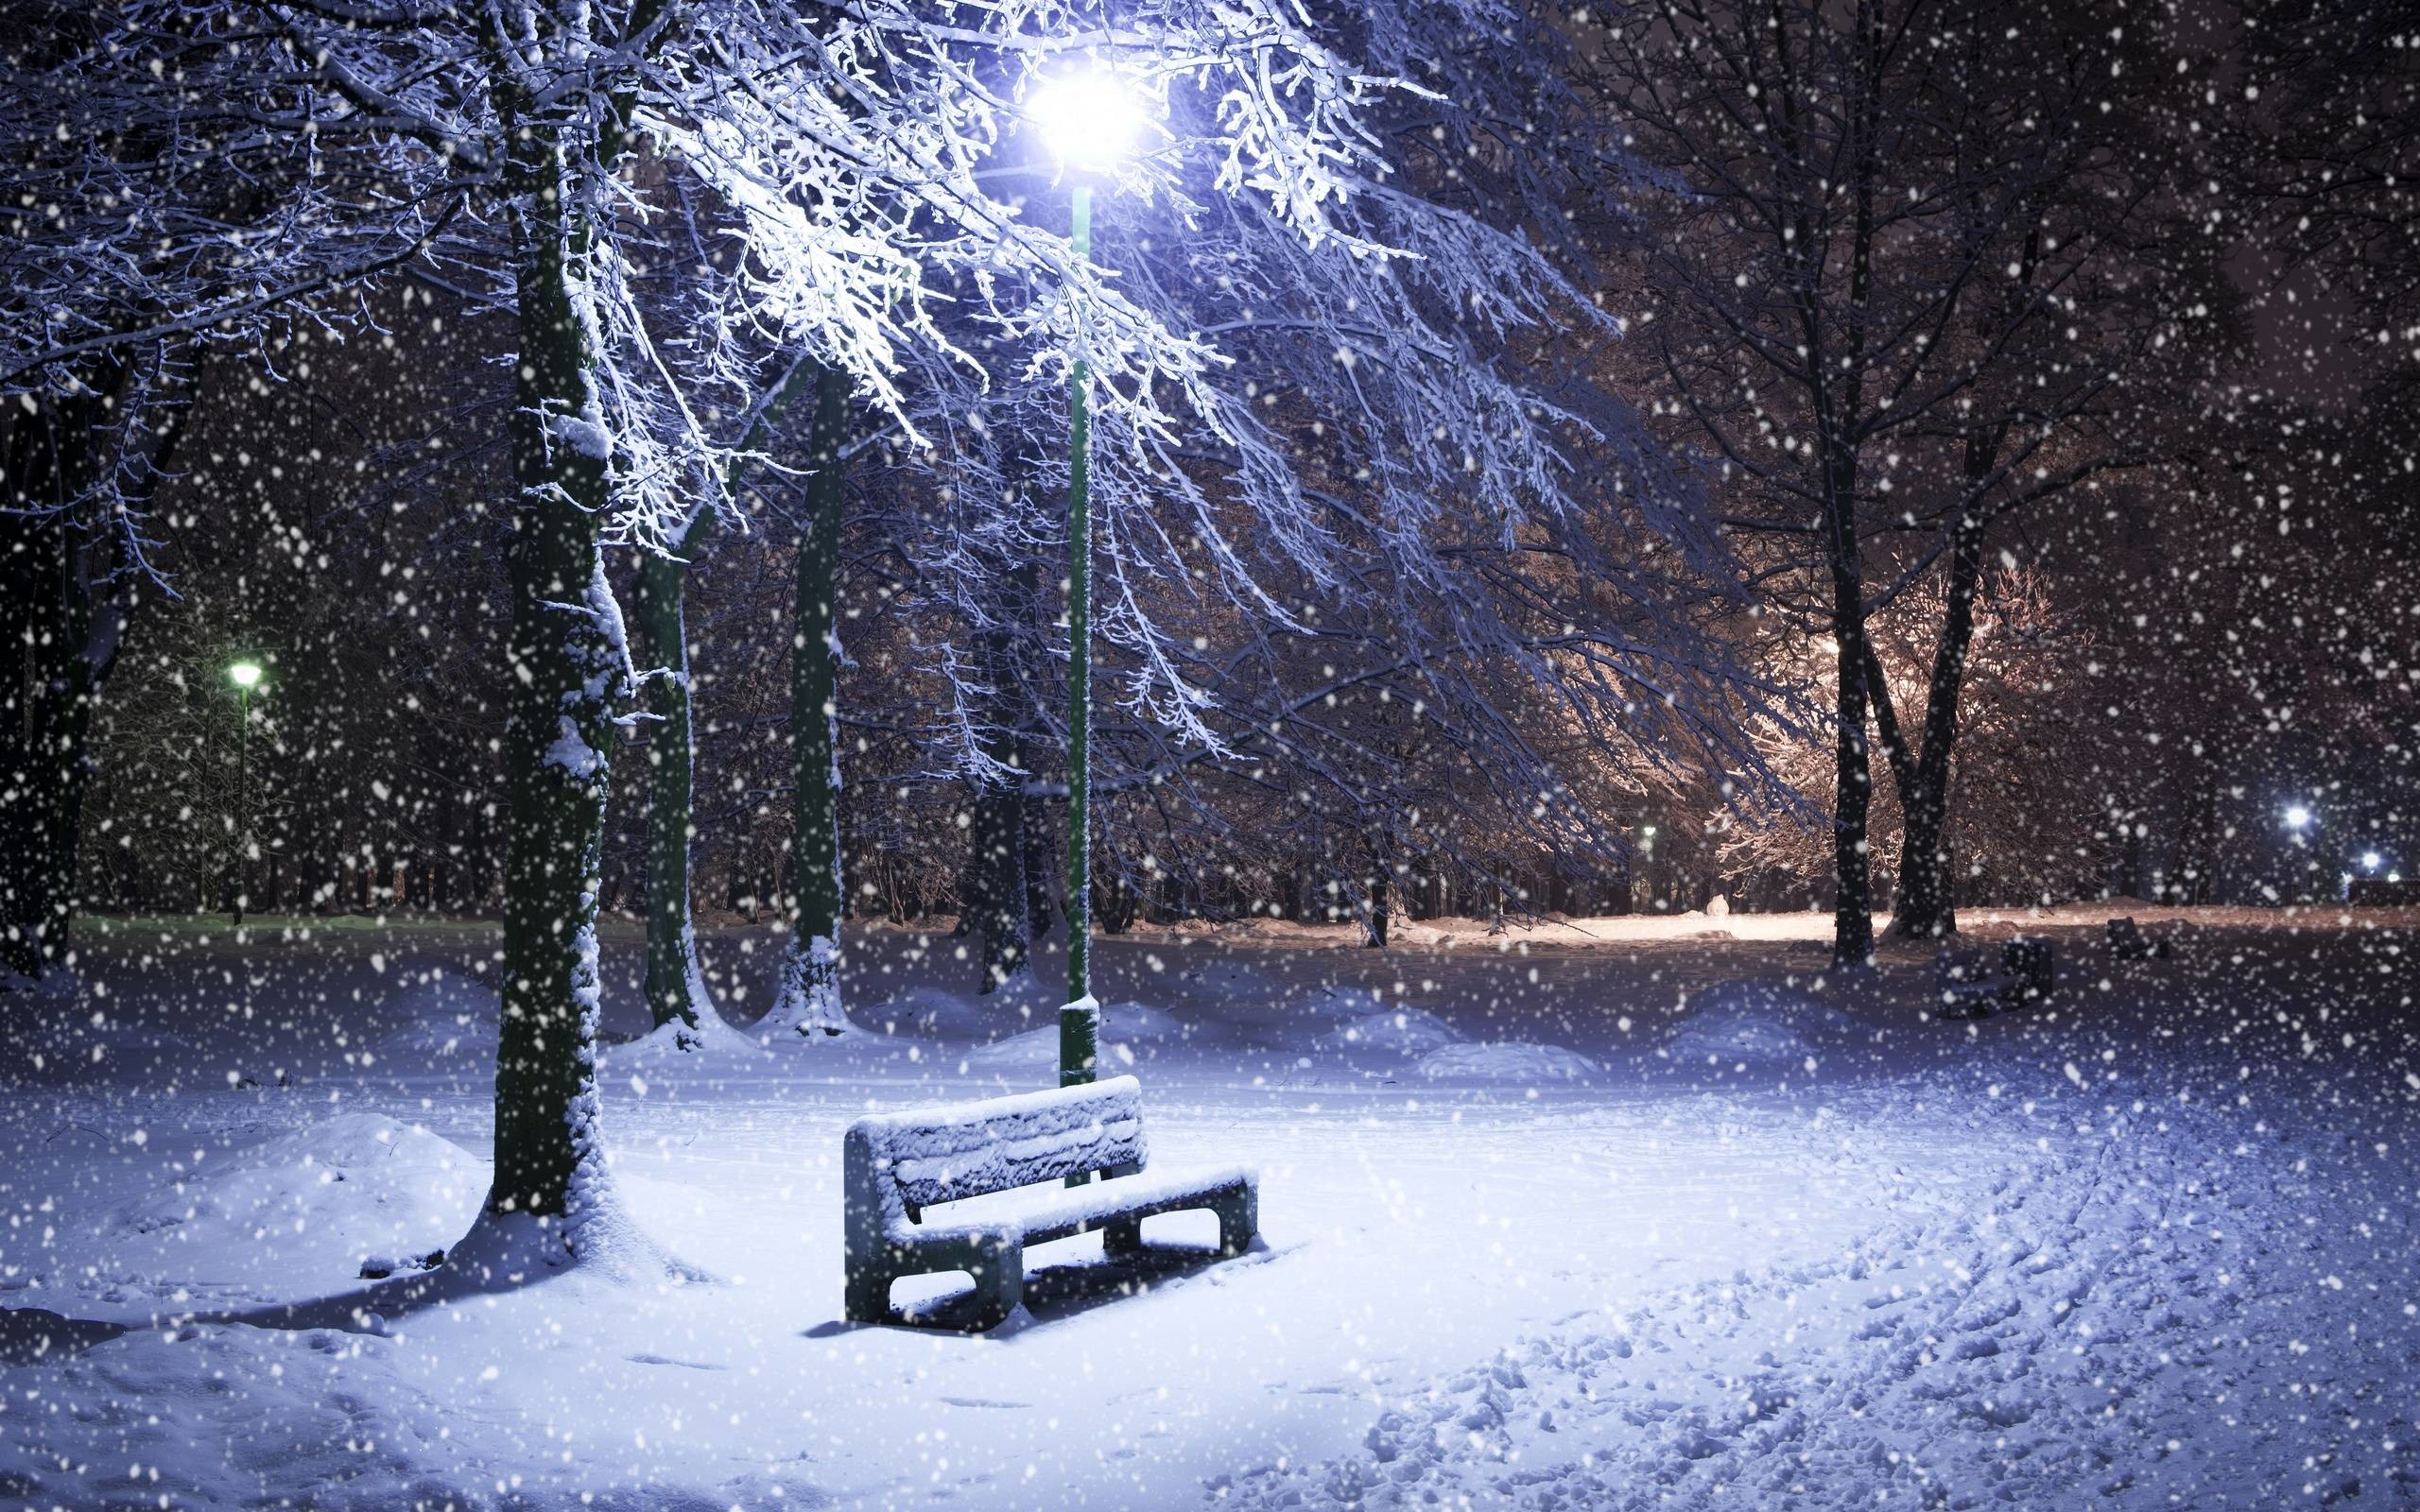 Winter HD Wallpapers Backgrounds Wallpaper × Winter